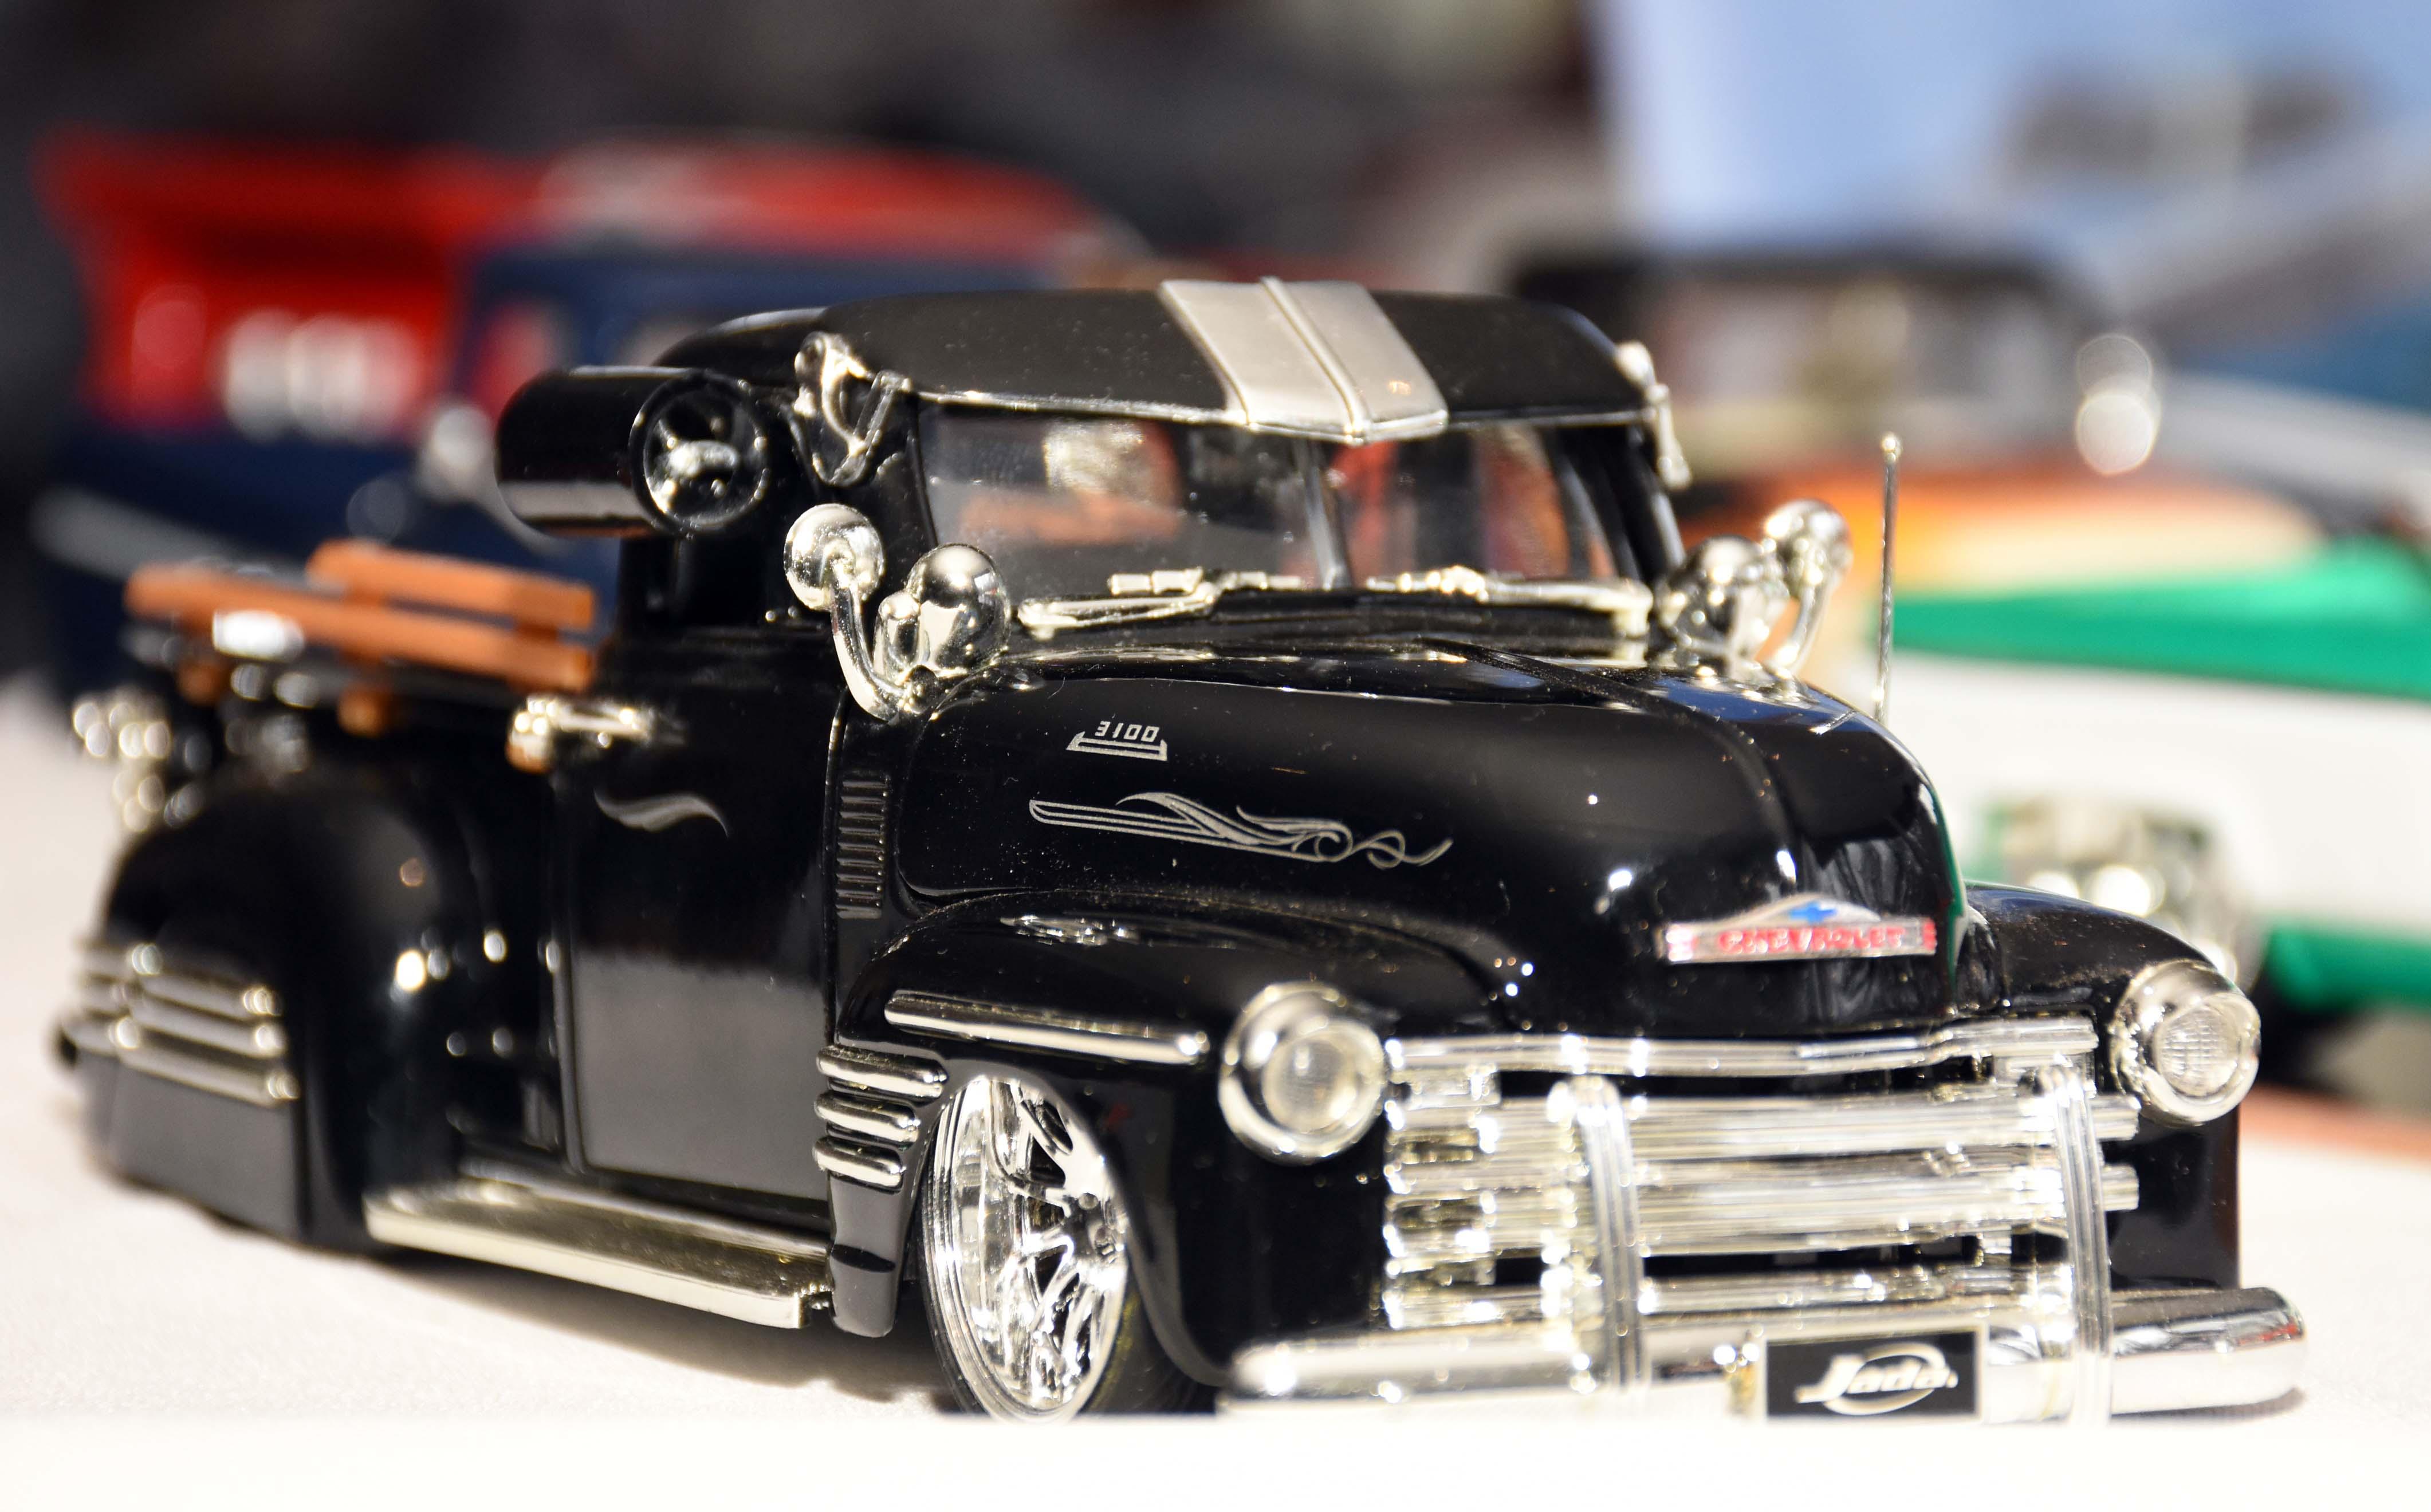 Exposición de autos a escala en La Barraca (7)